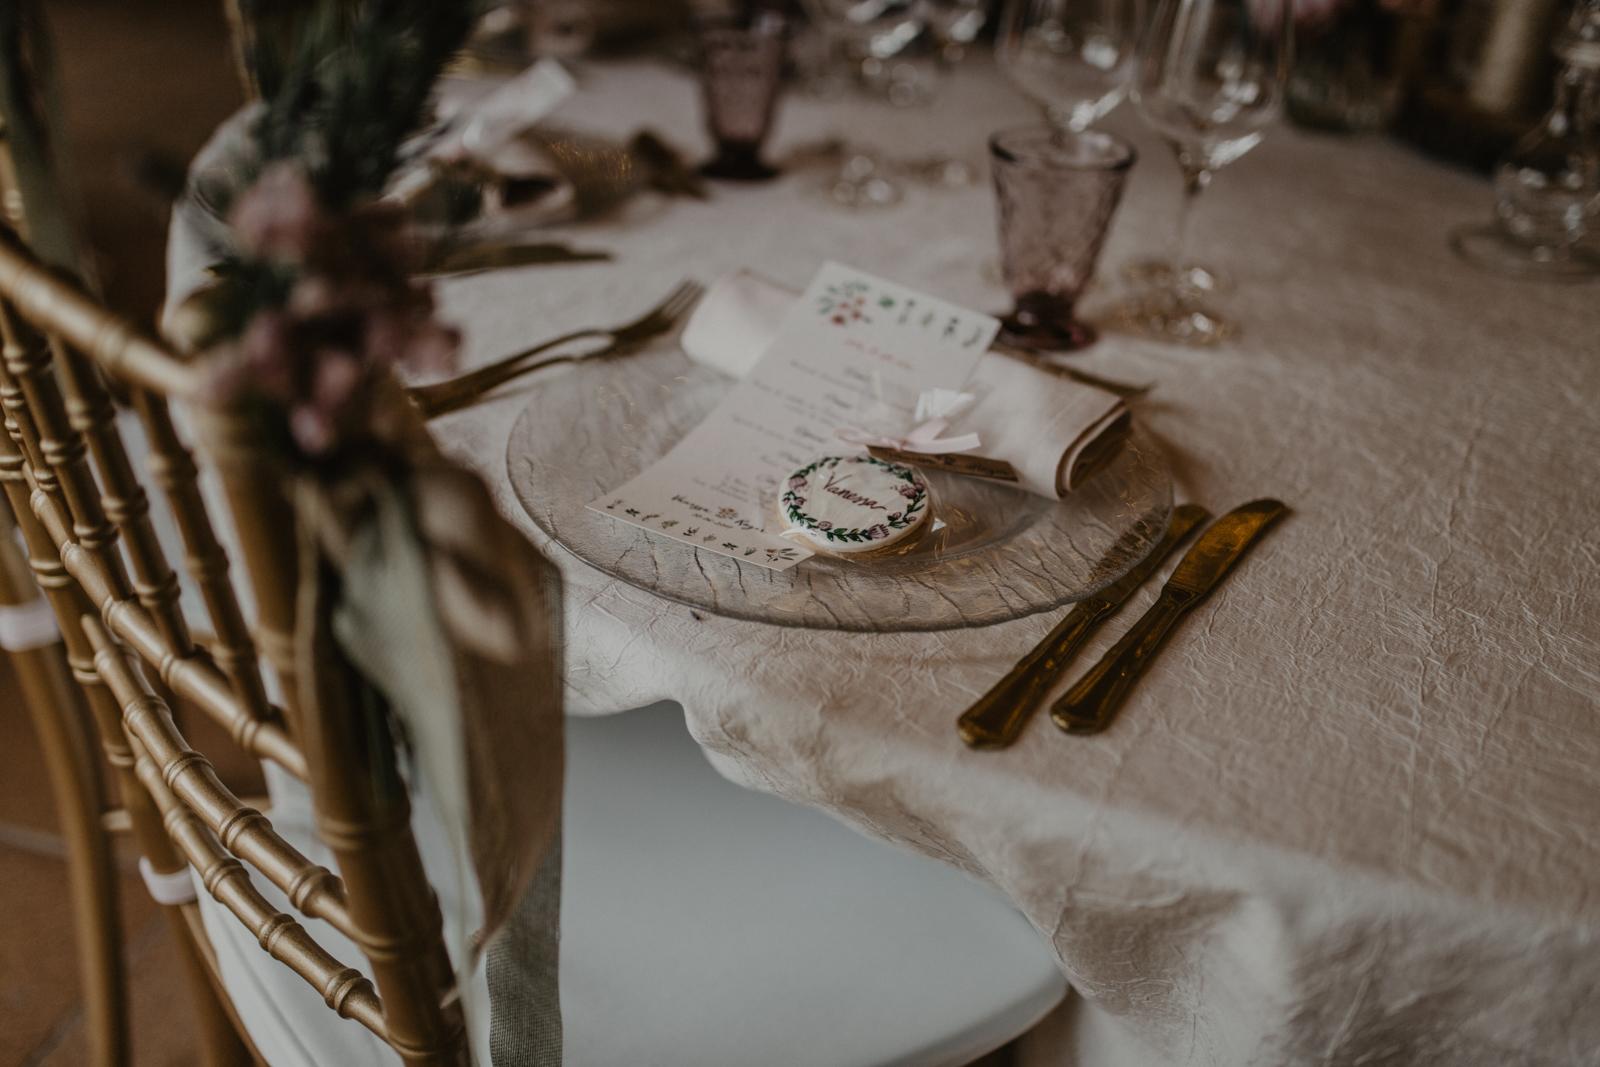 thenortherngirlphotography_photography_thenortherngirl_rebeccascabros_wedding_weddingphotography_weddingphotographer_barcelona_bodaenbarcelona_bodaenmaselmarti_bodarogeryvane-602.jpg